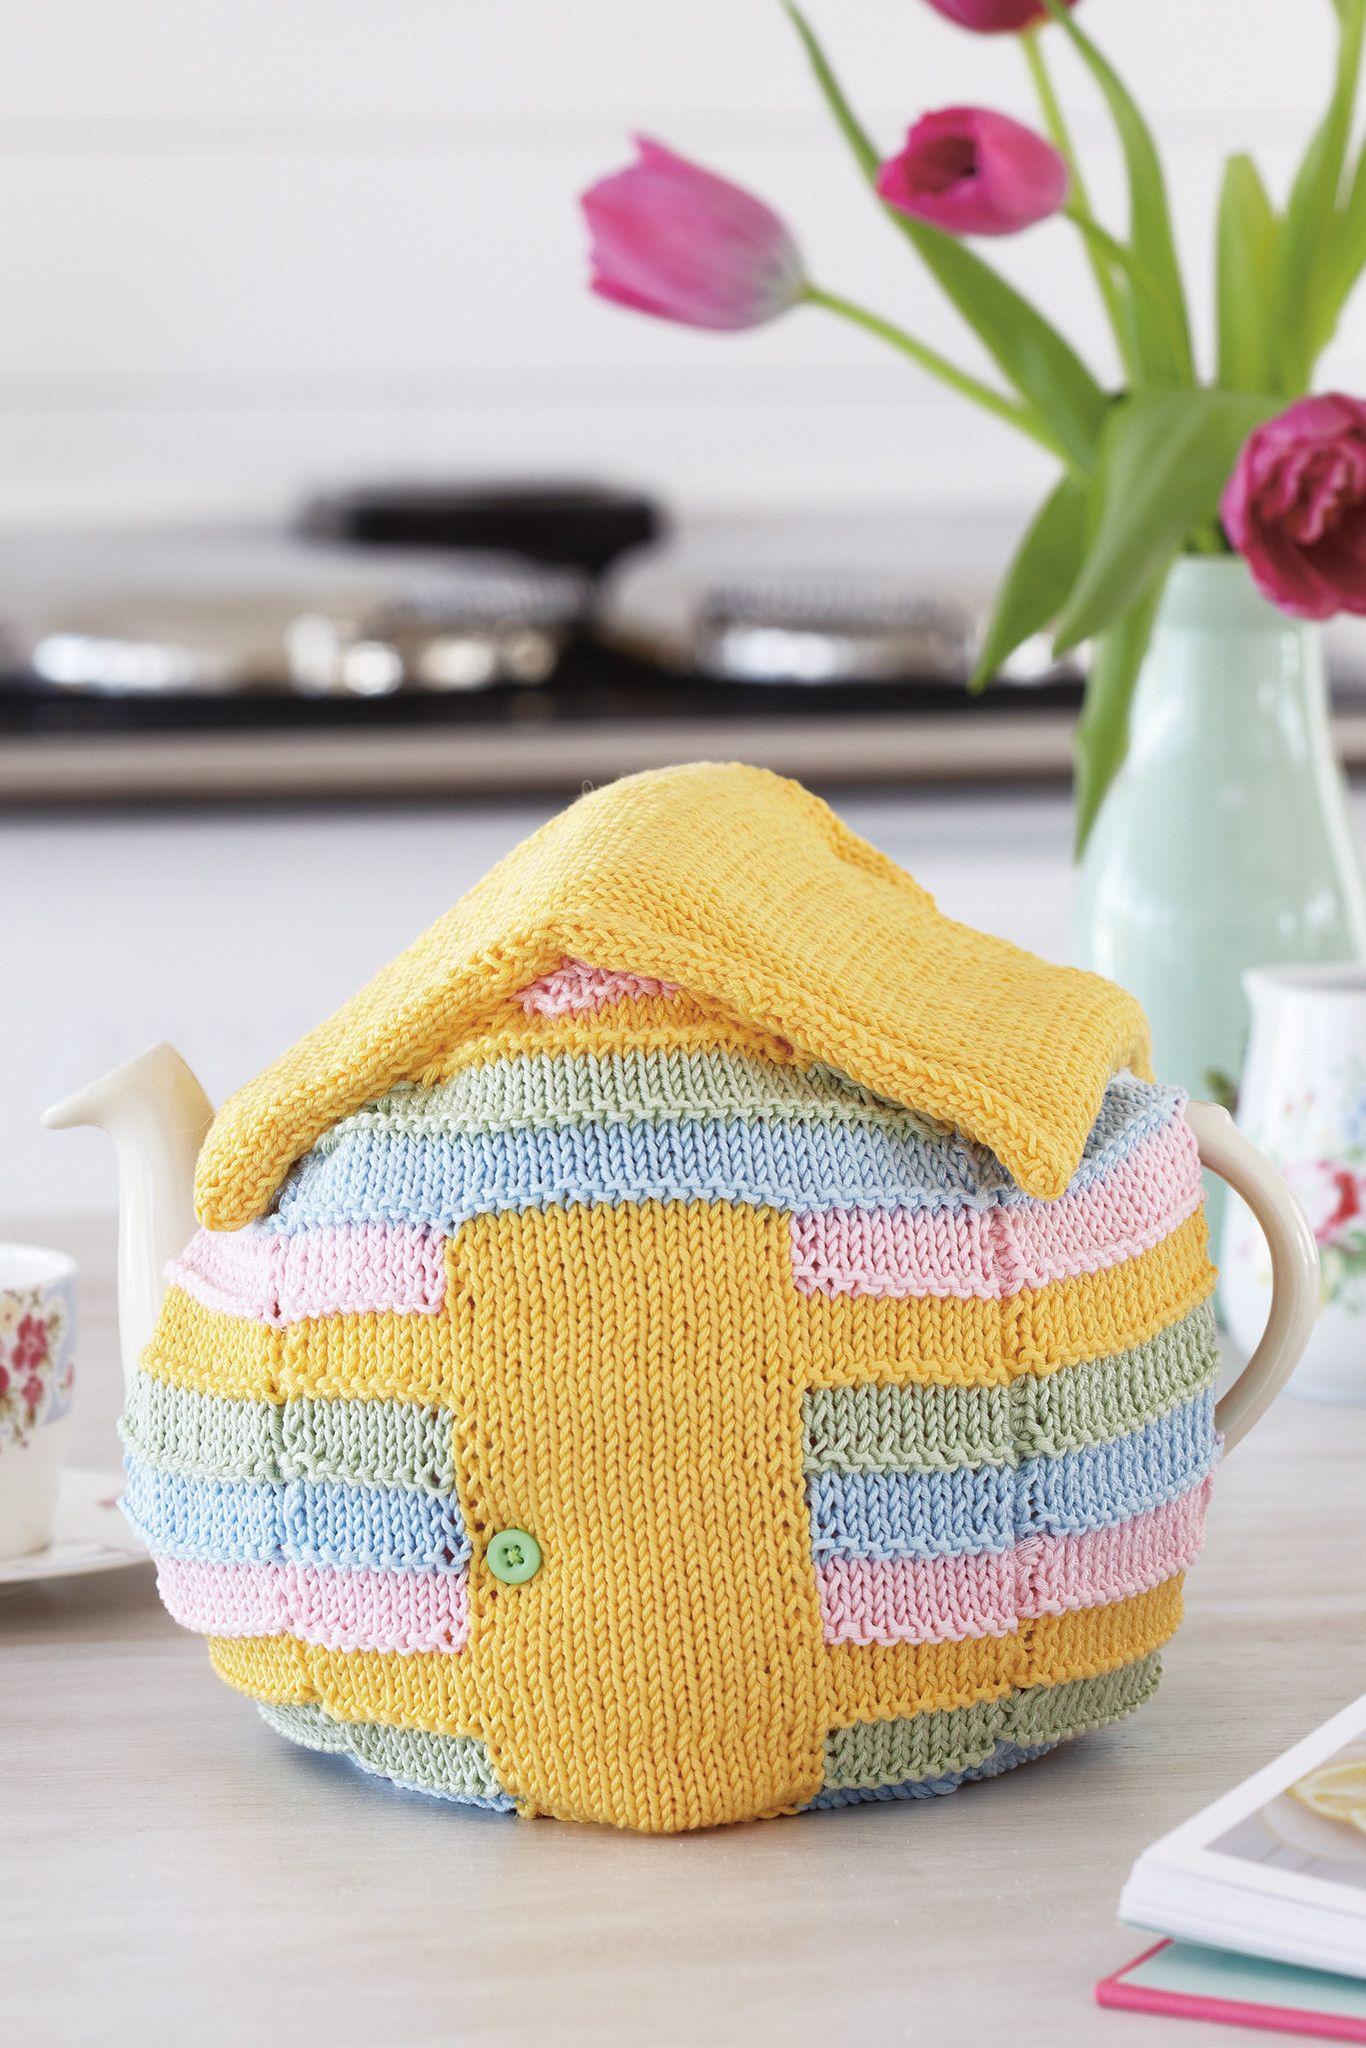 Beach Hut Tea Cosy Knitting Pattern   Pinterest   Teteras y Tejido